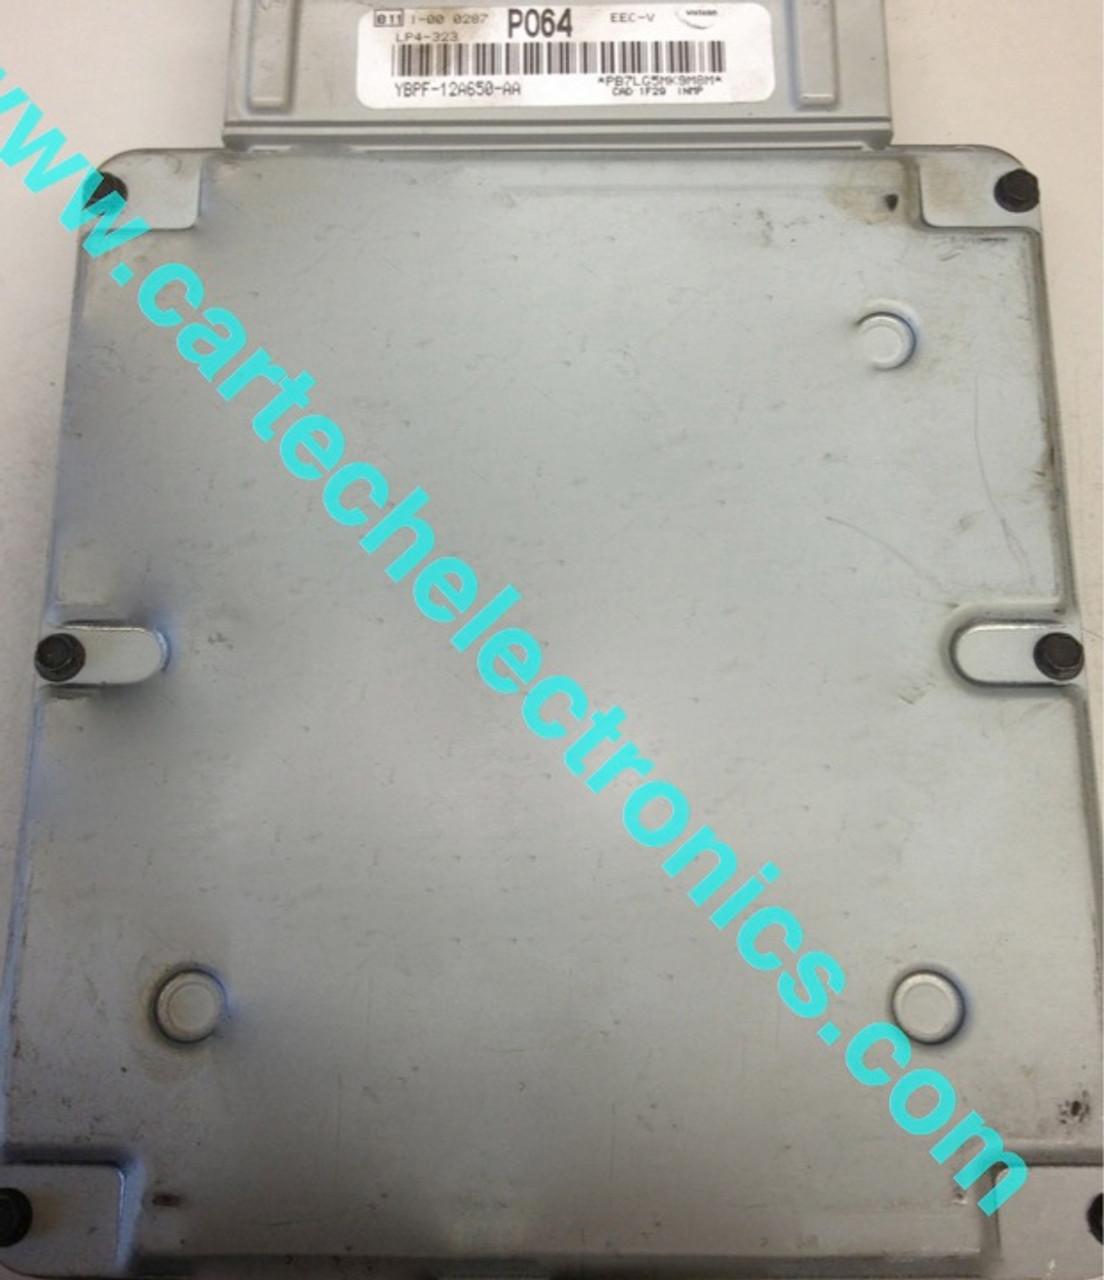 Plug & Play Visteon Engine ECU, YBPF-12A650-AA, P064, LP4-323, EEC-V